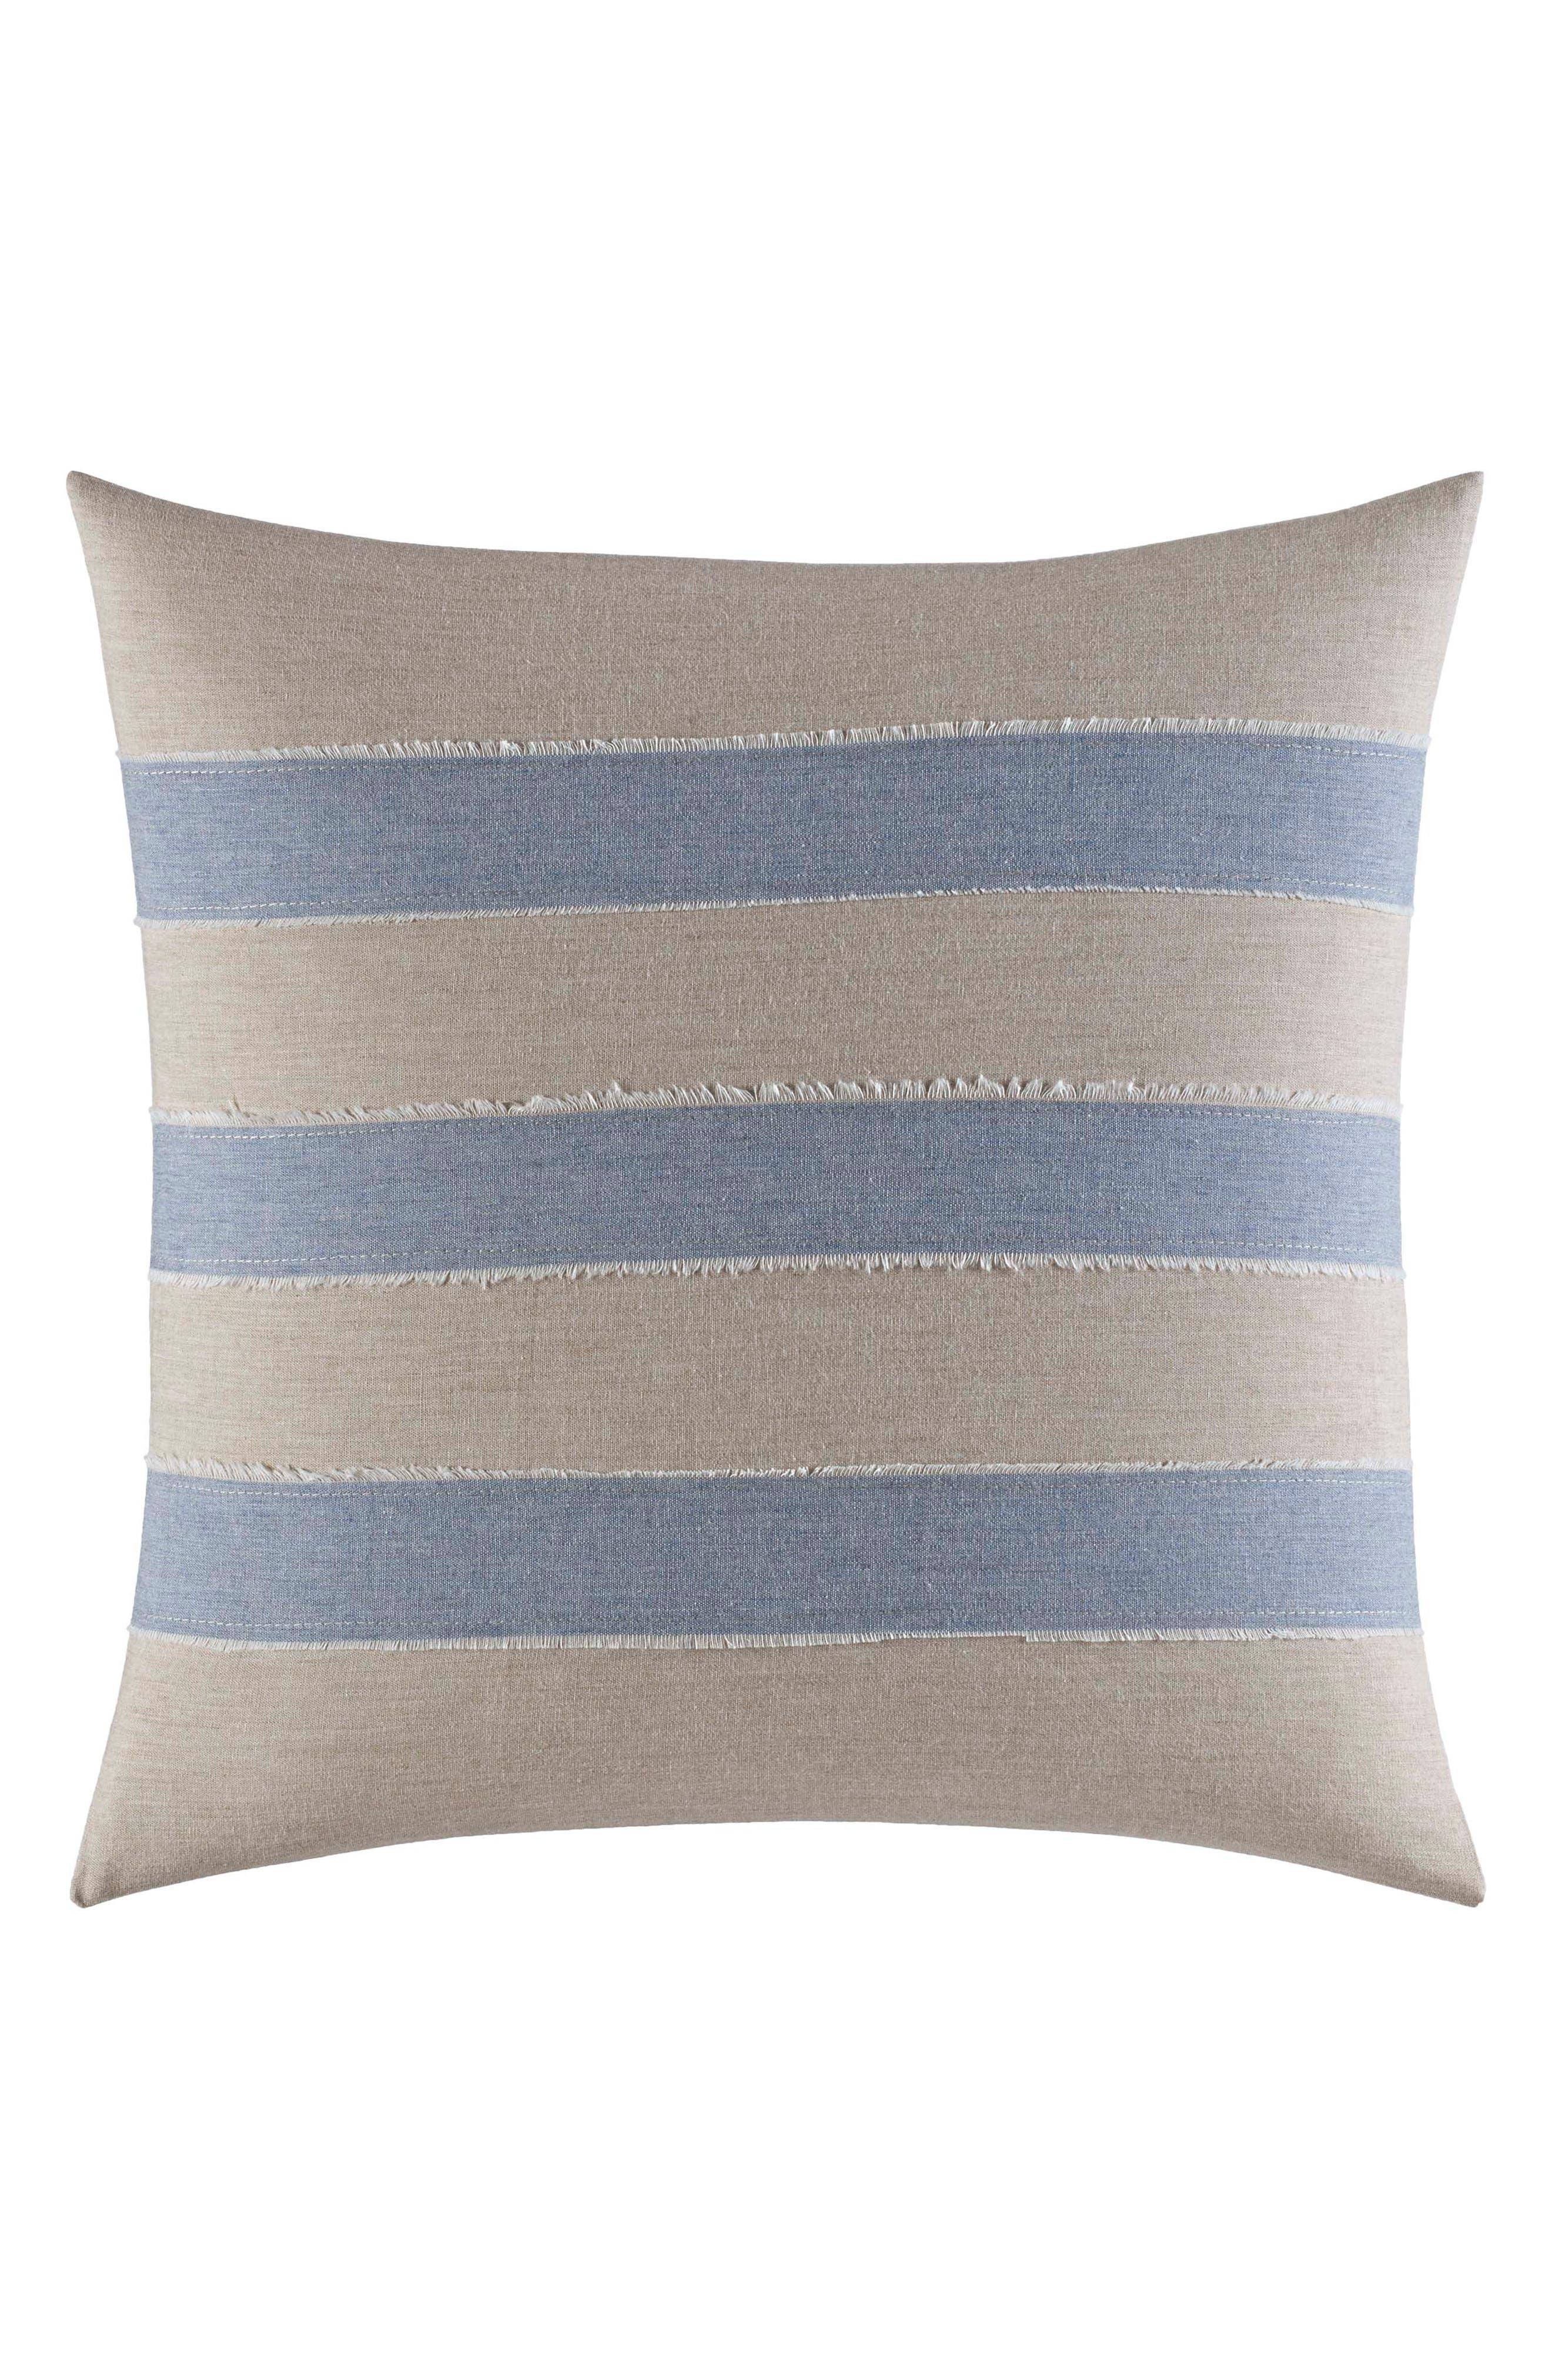 Abbot Accent Pillow,                         Main,                         color, Light Beige